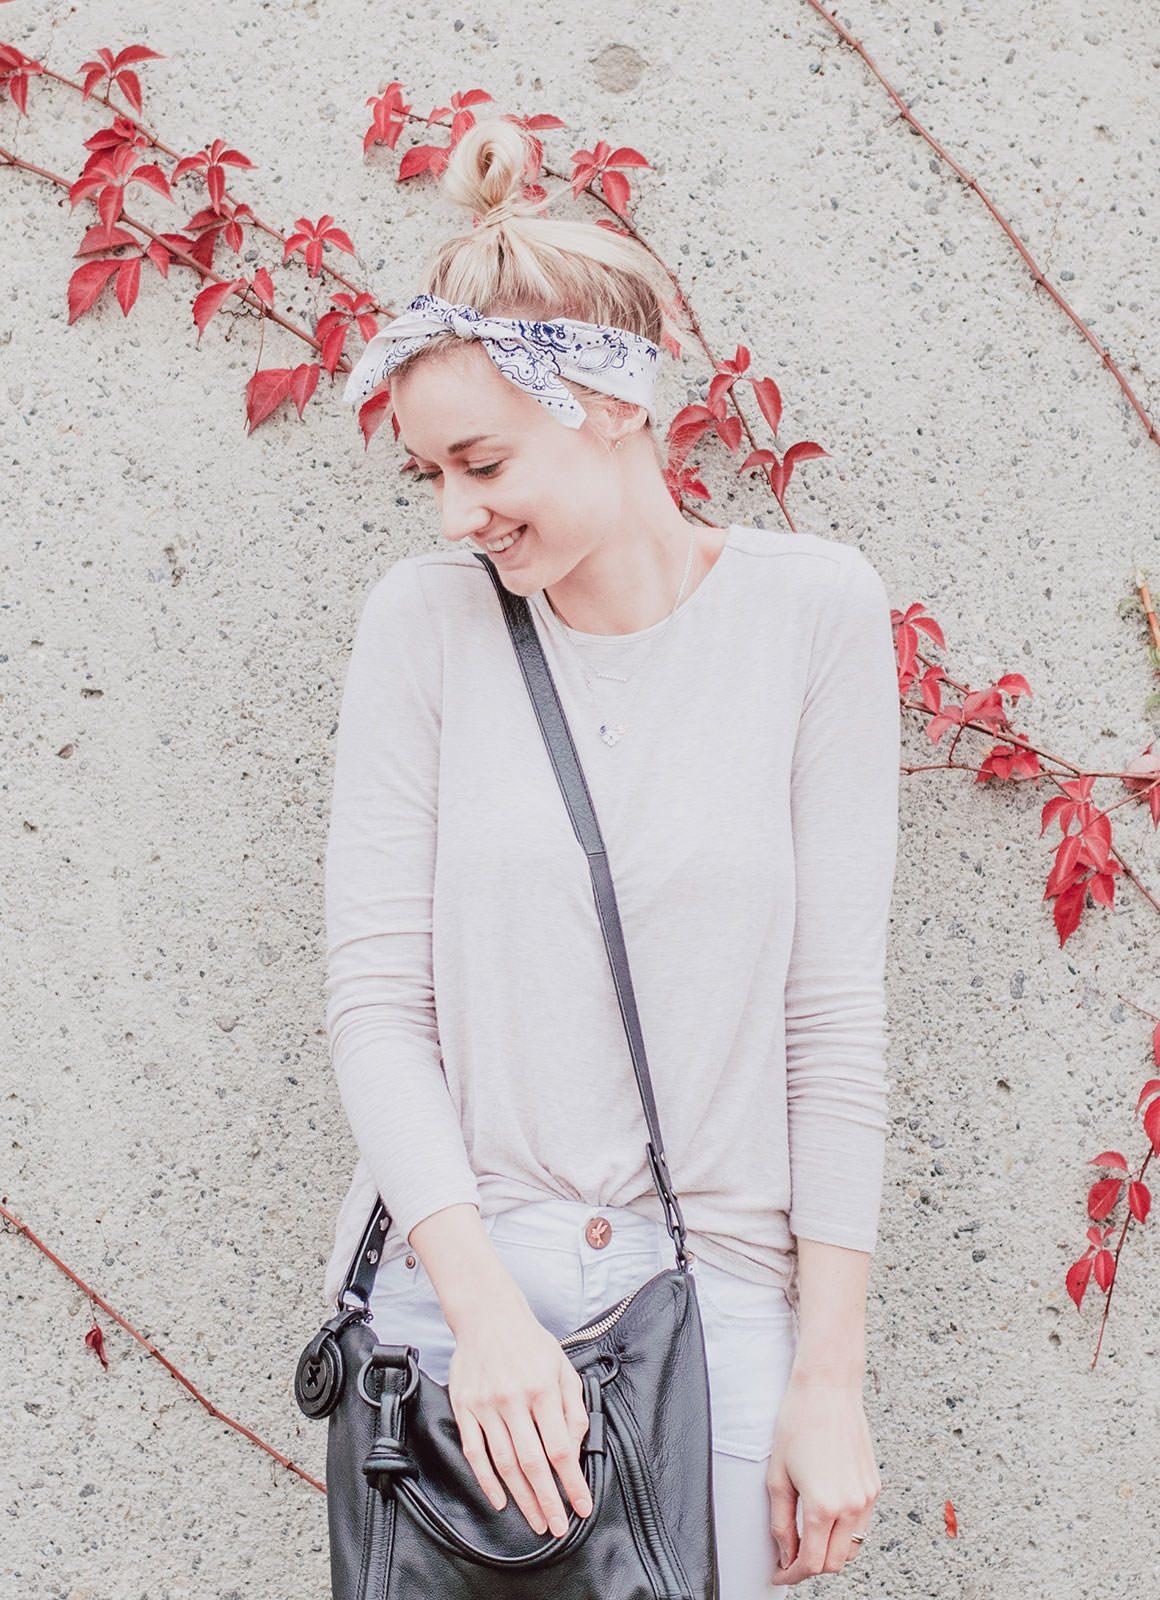 3 Ways to Wear the Bandana